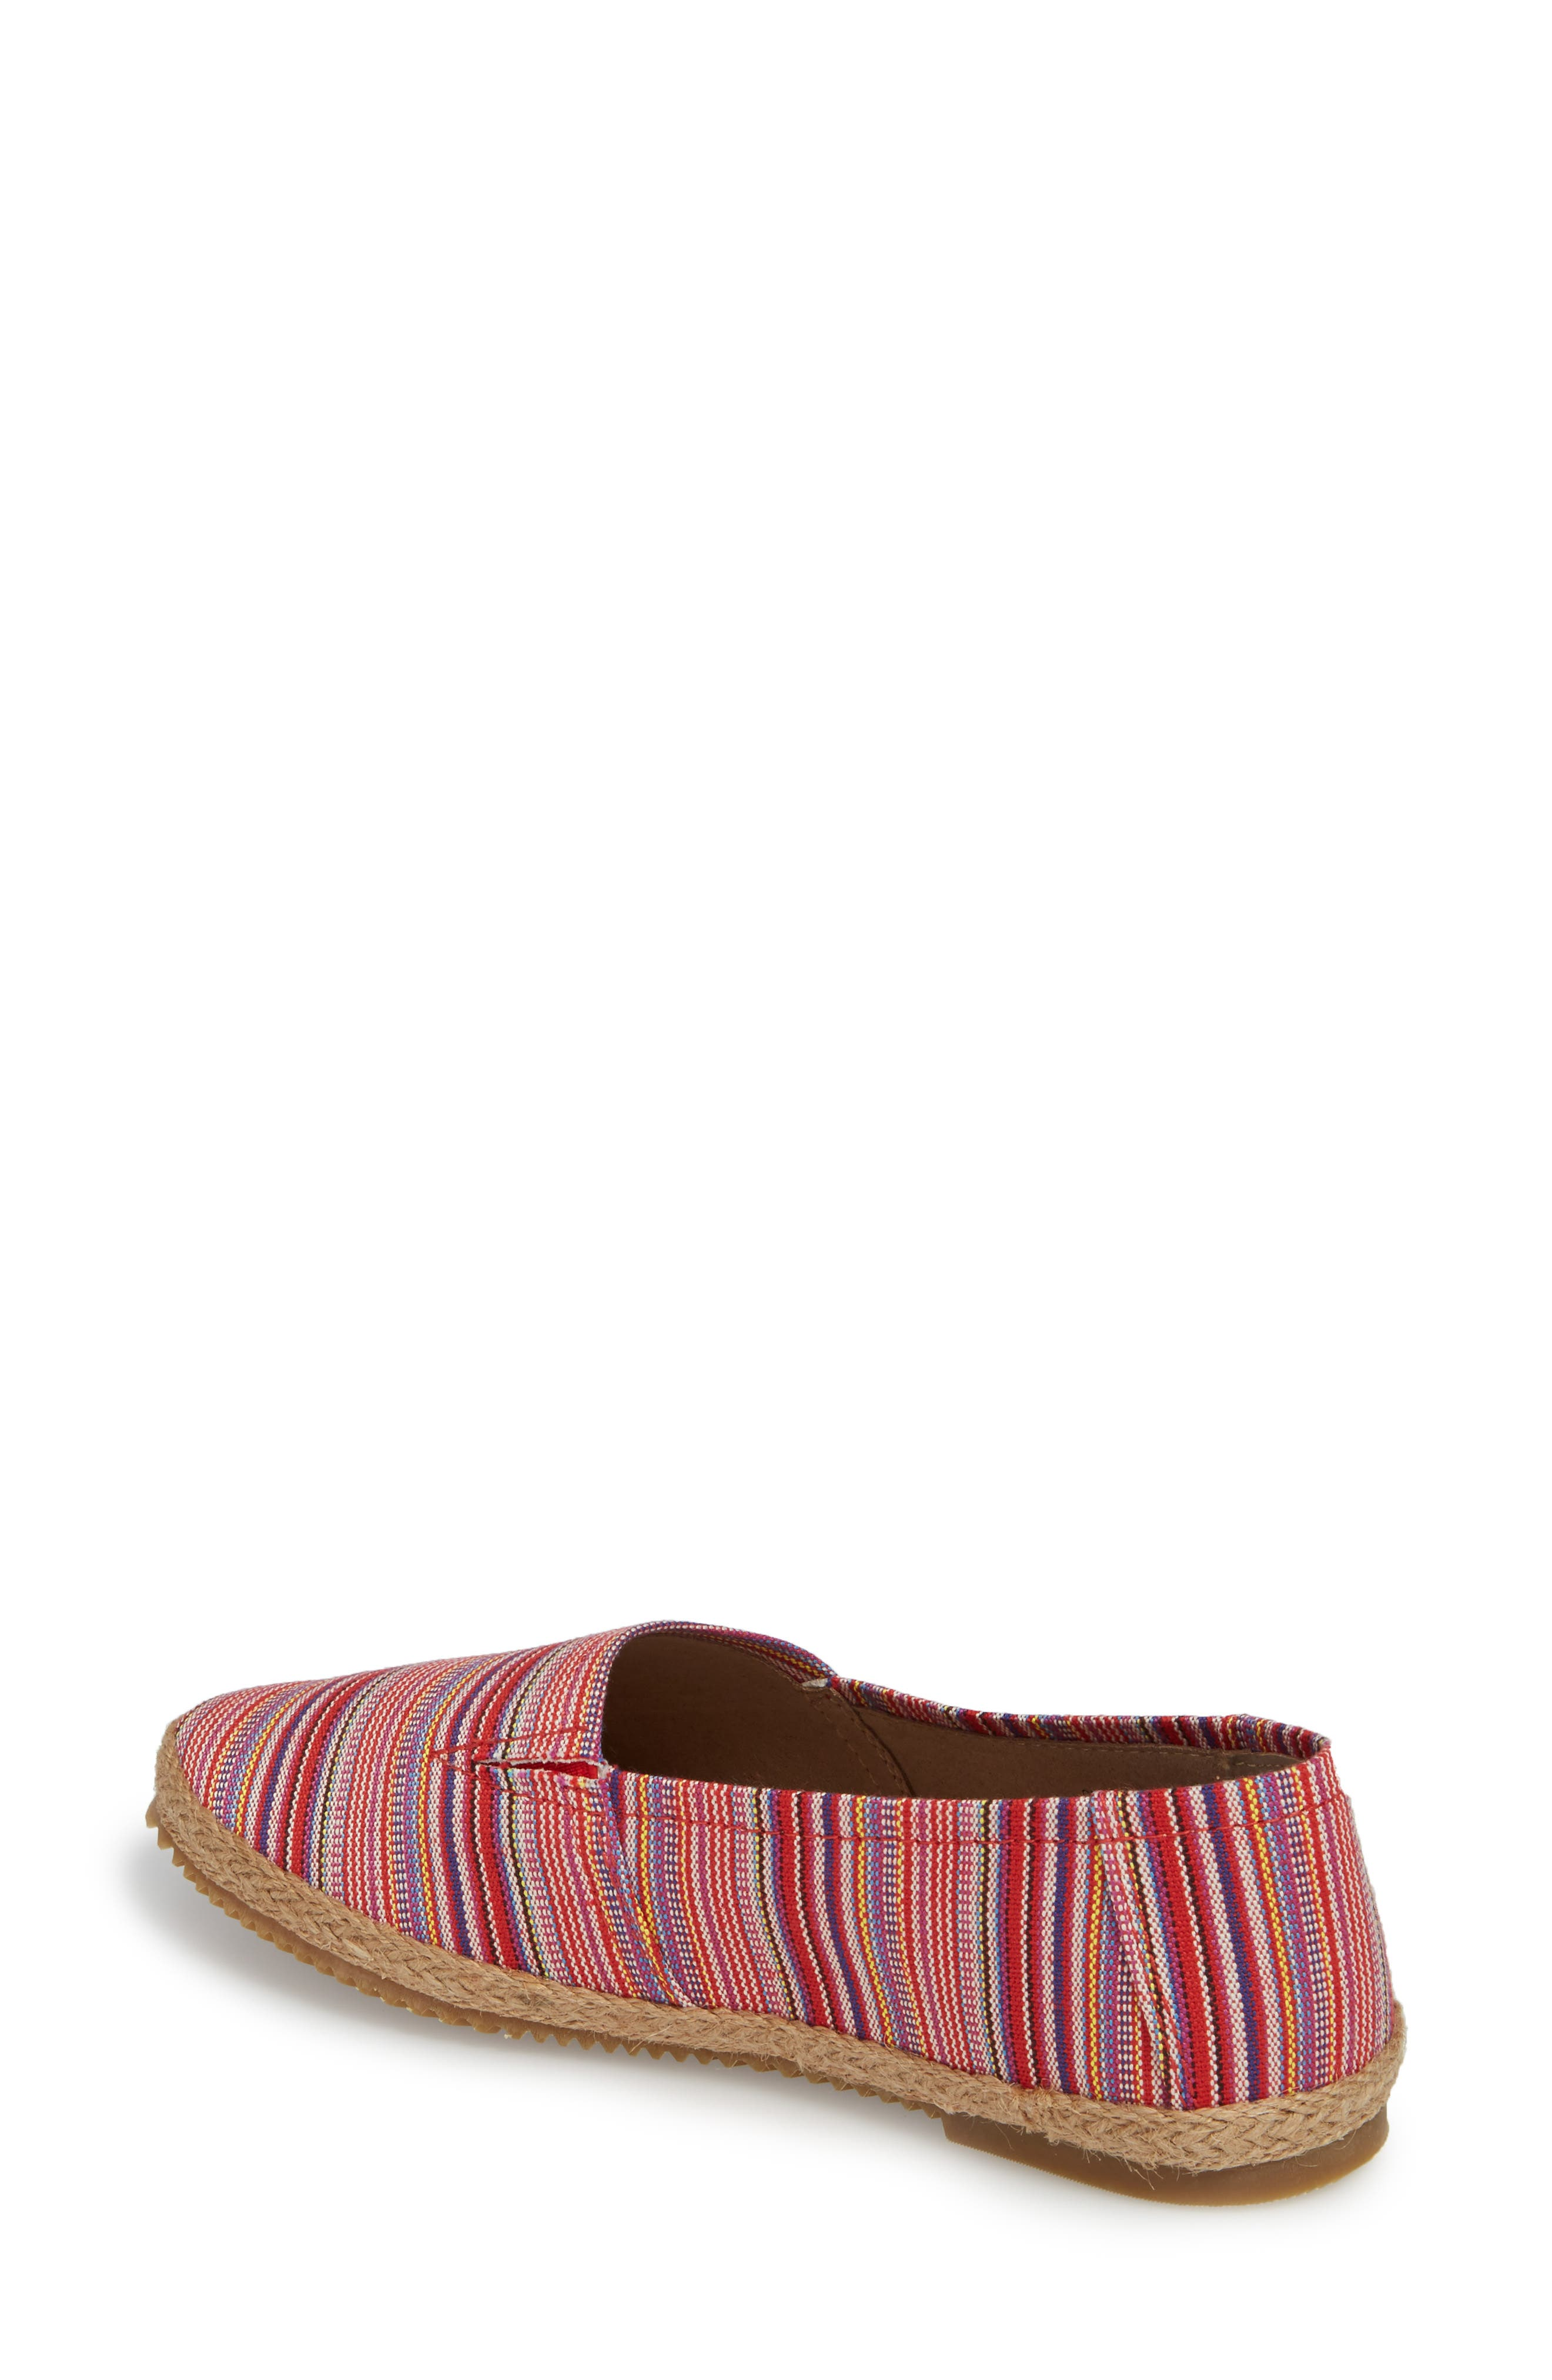 Kylie Slip-On,                             Alternate thumbnail 2, color,                             Pink Stripe Fabric